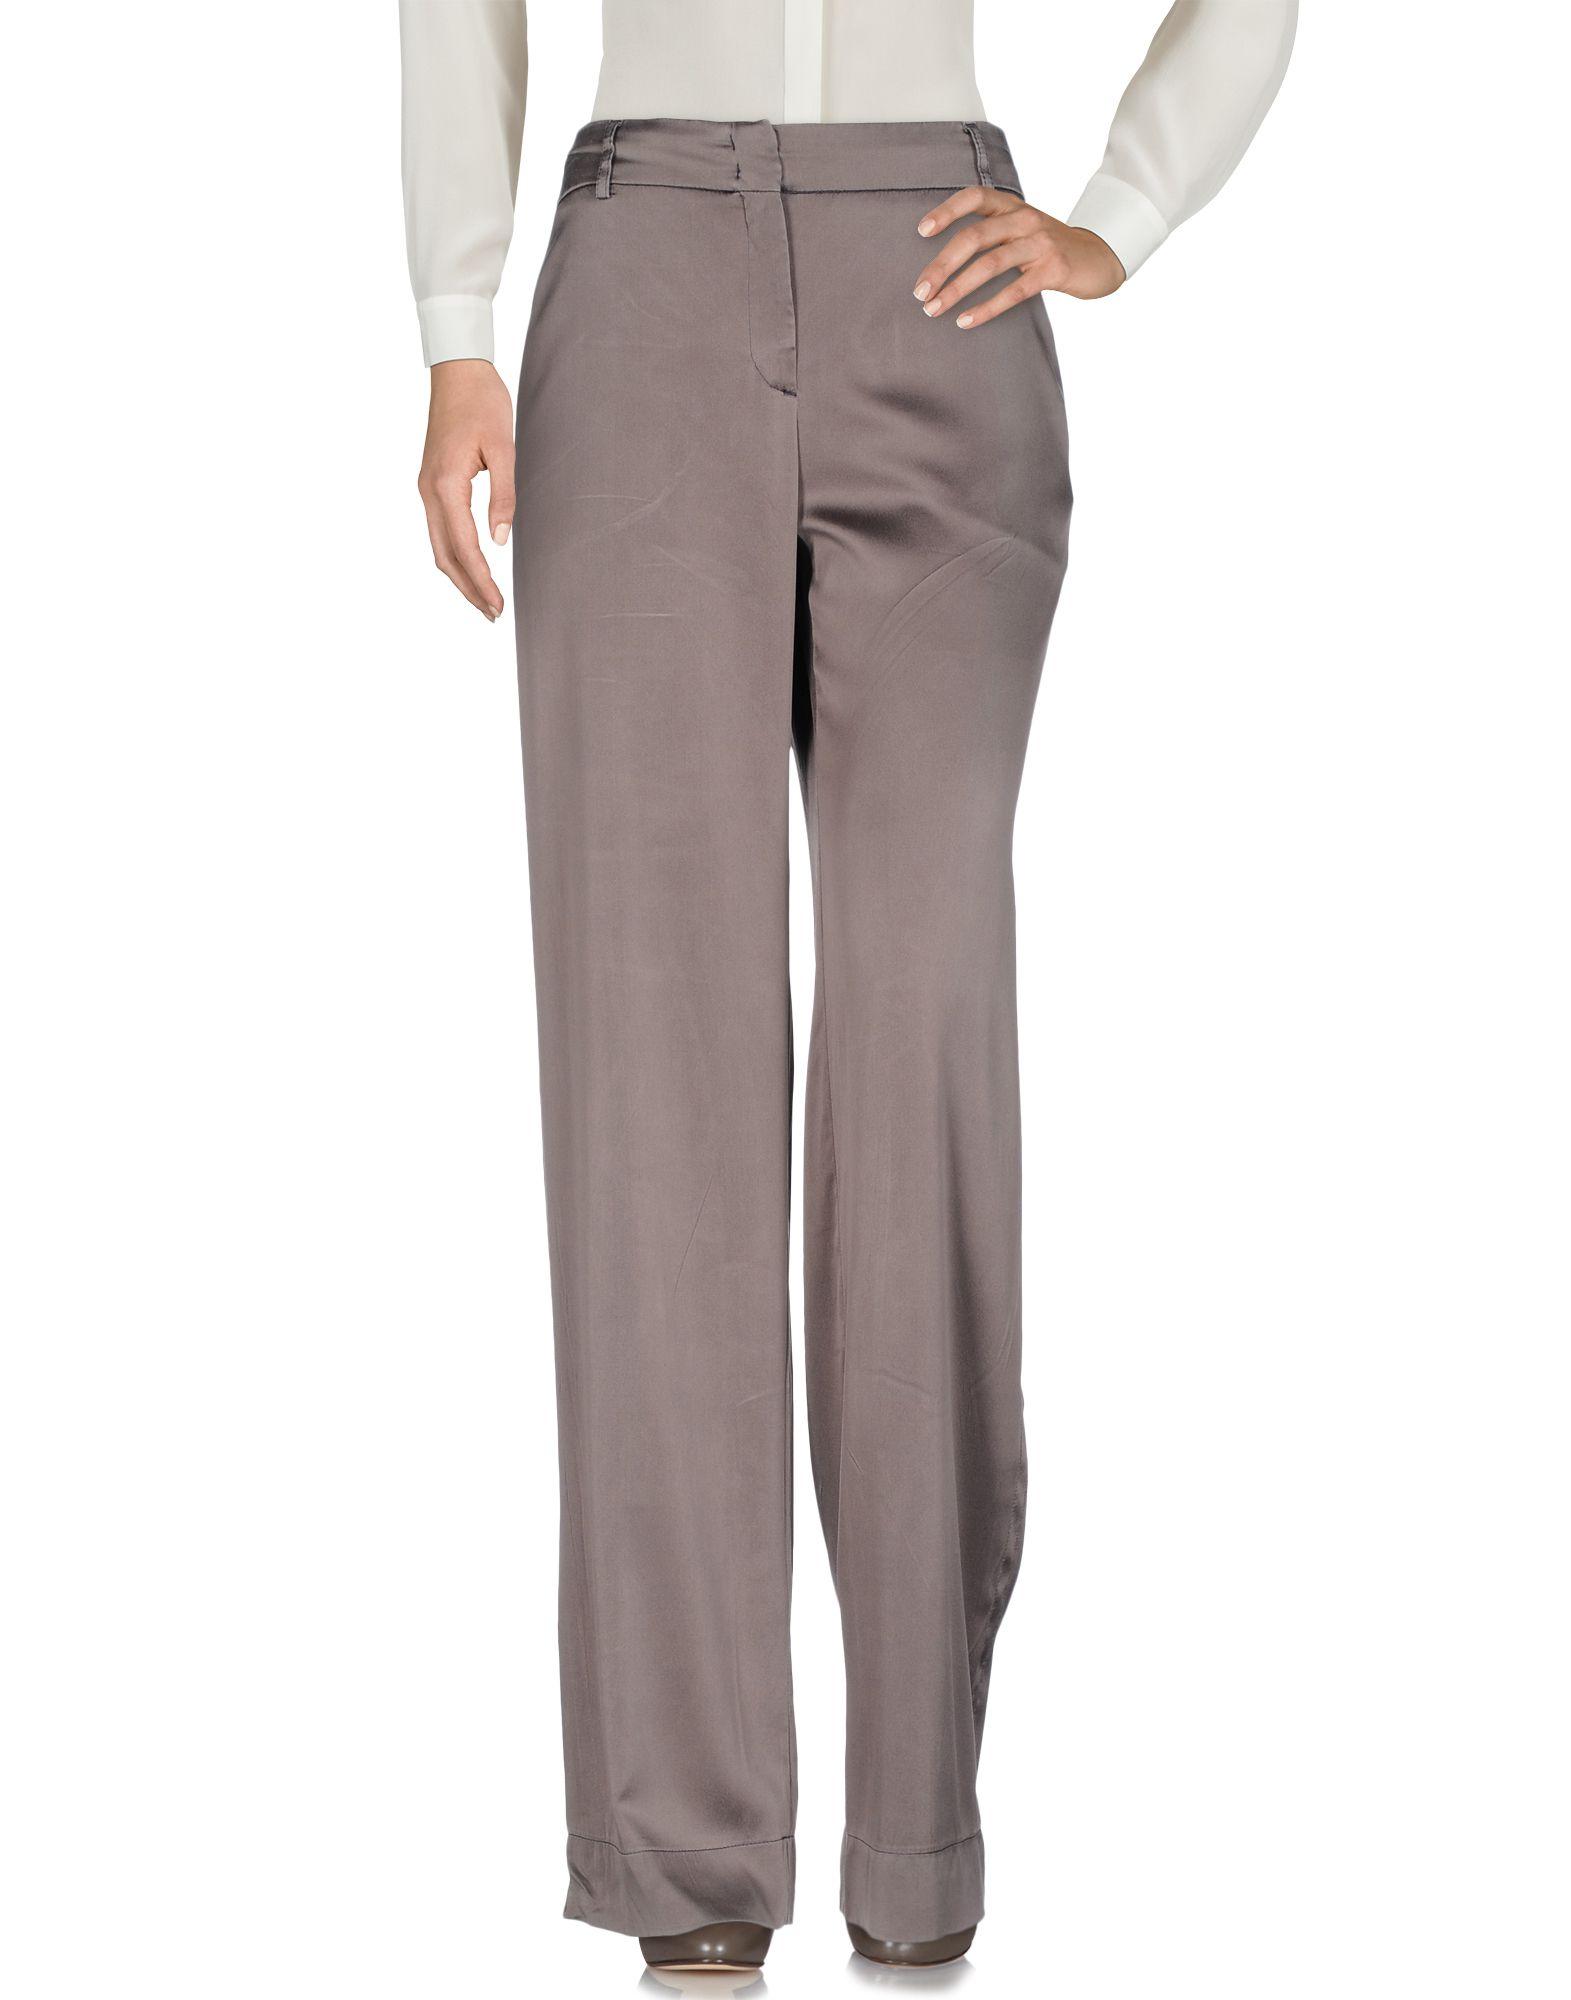 INCOTEX Damen Hose Farbe Dunkelbraun Größe 7 - broschei